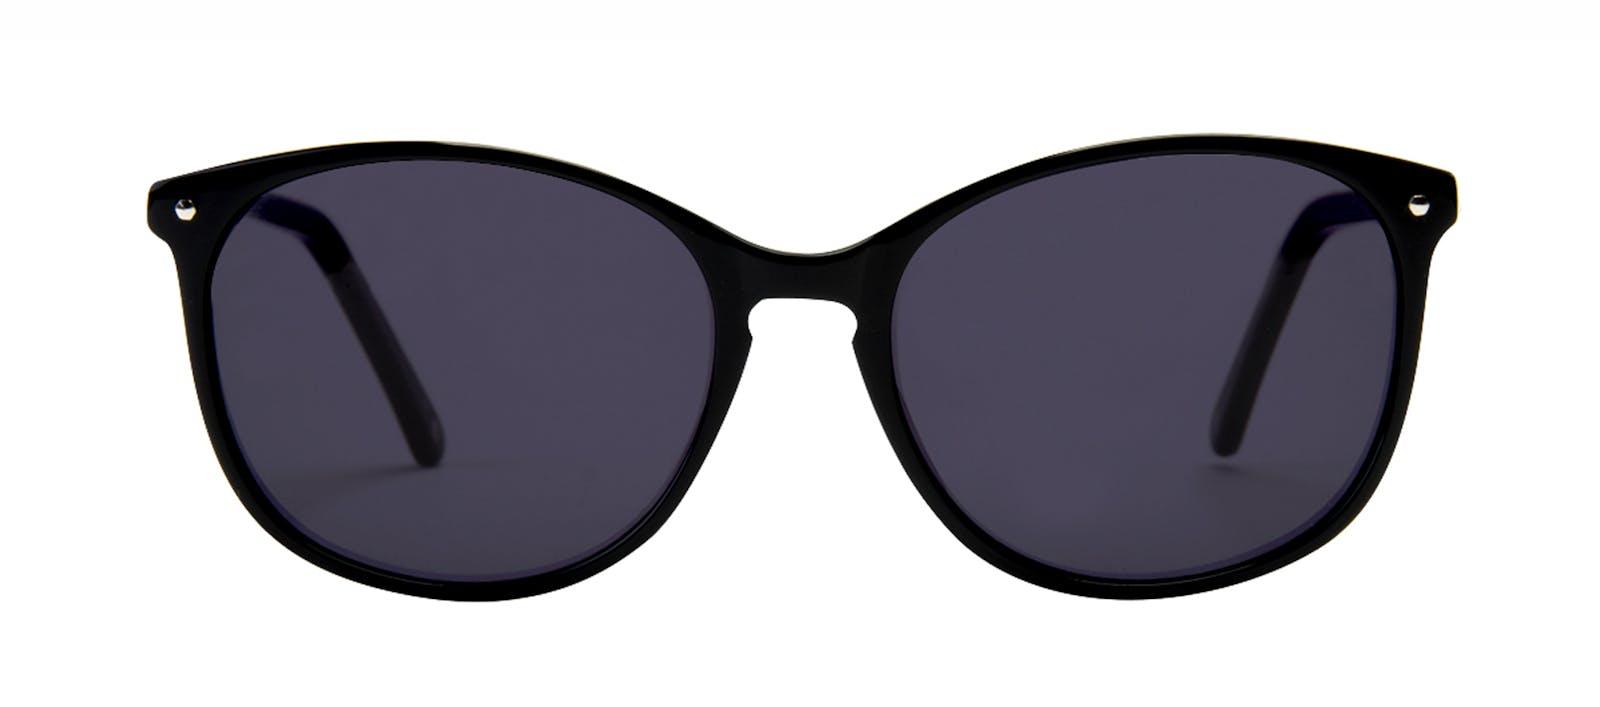 Affordable Fashion Glasses Rectangle Square Round Sunglasses Women Nadine  Pitch Black Front aca87e834